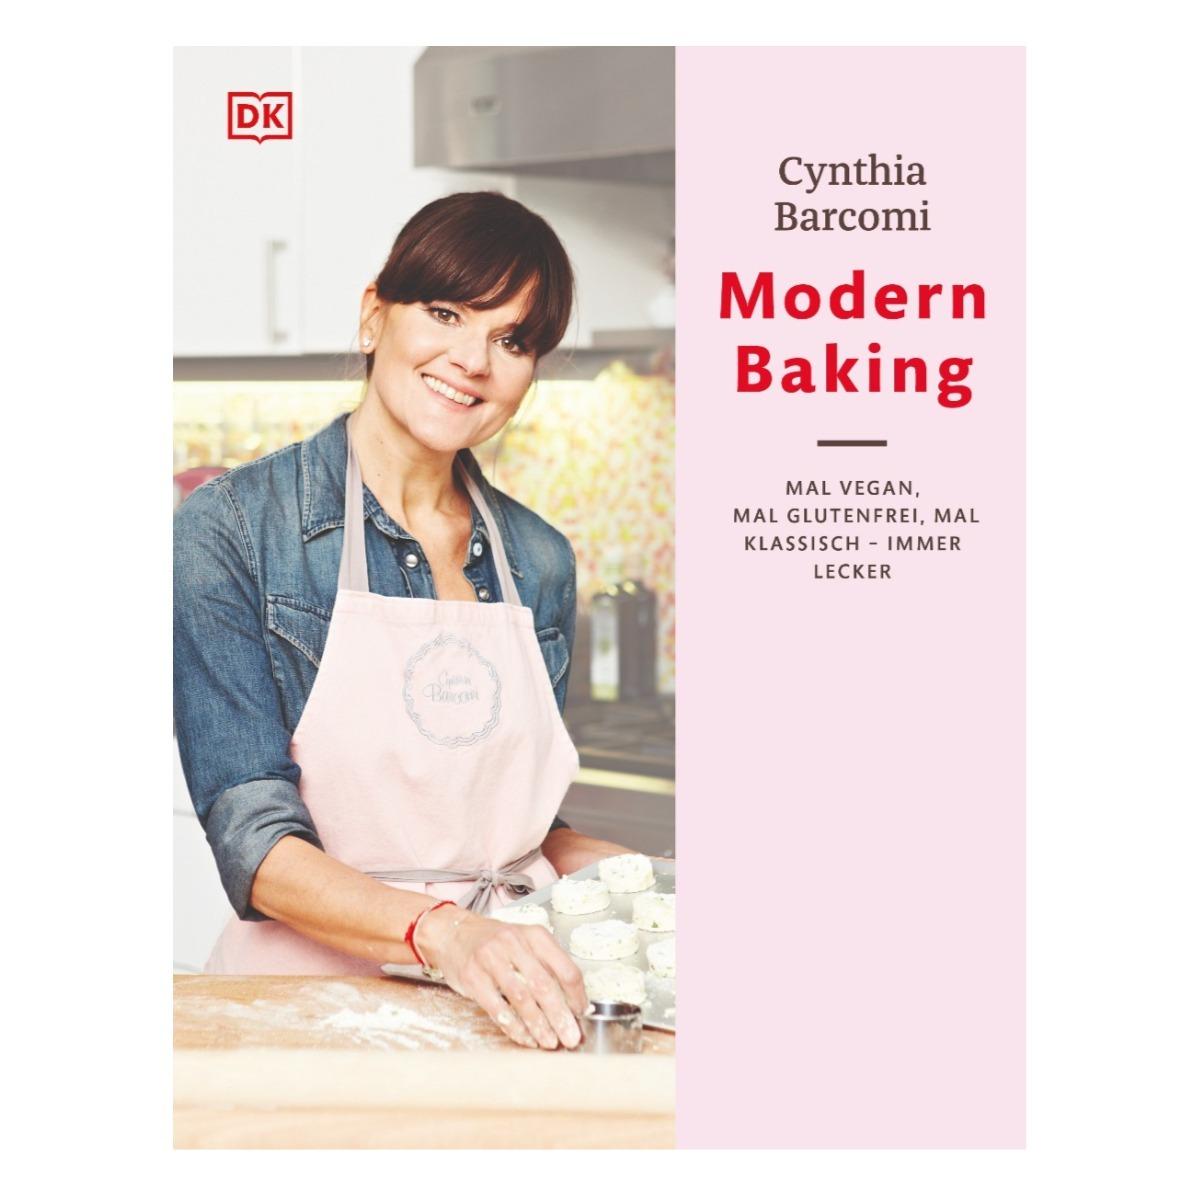 Modern Baking Cynthia Barcomi